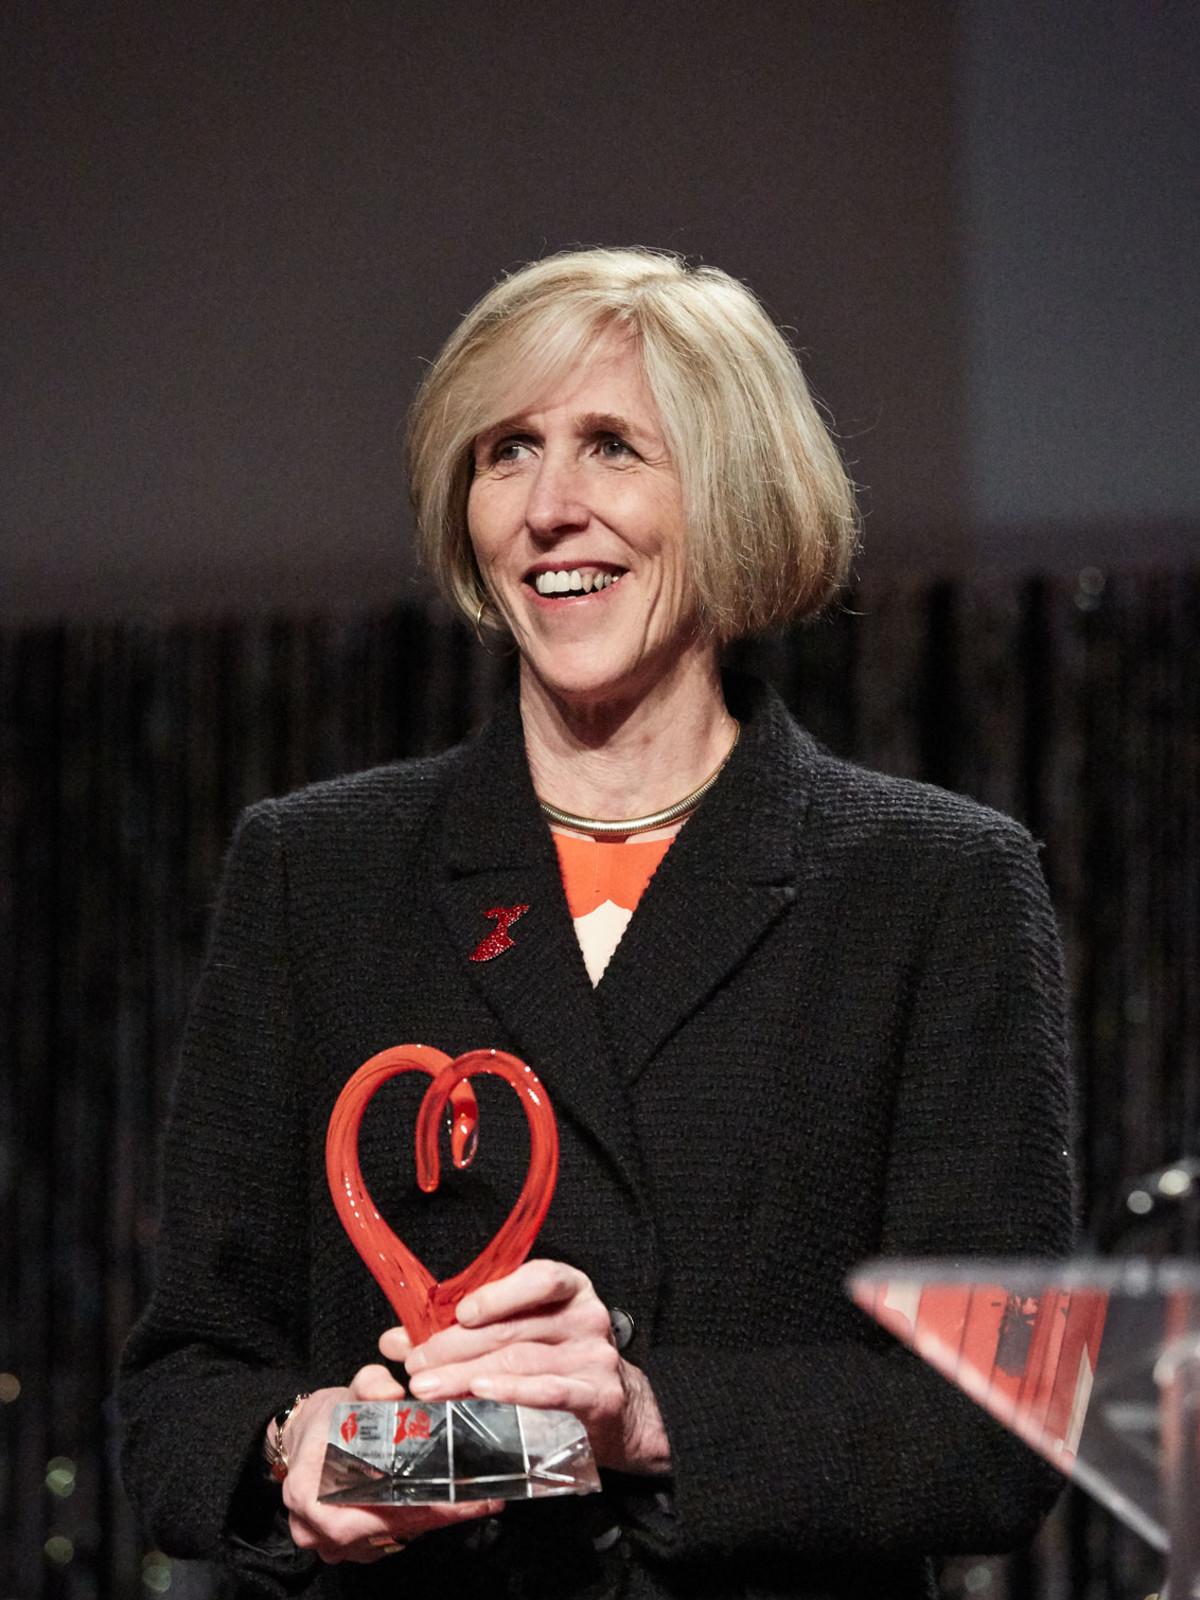 Dr. Helen Hobbs